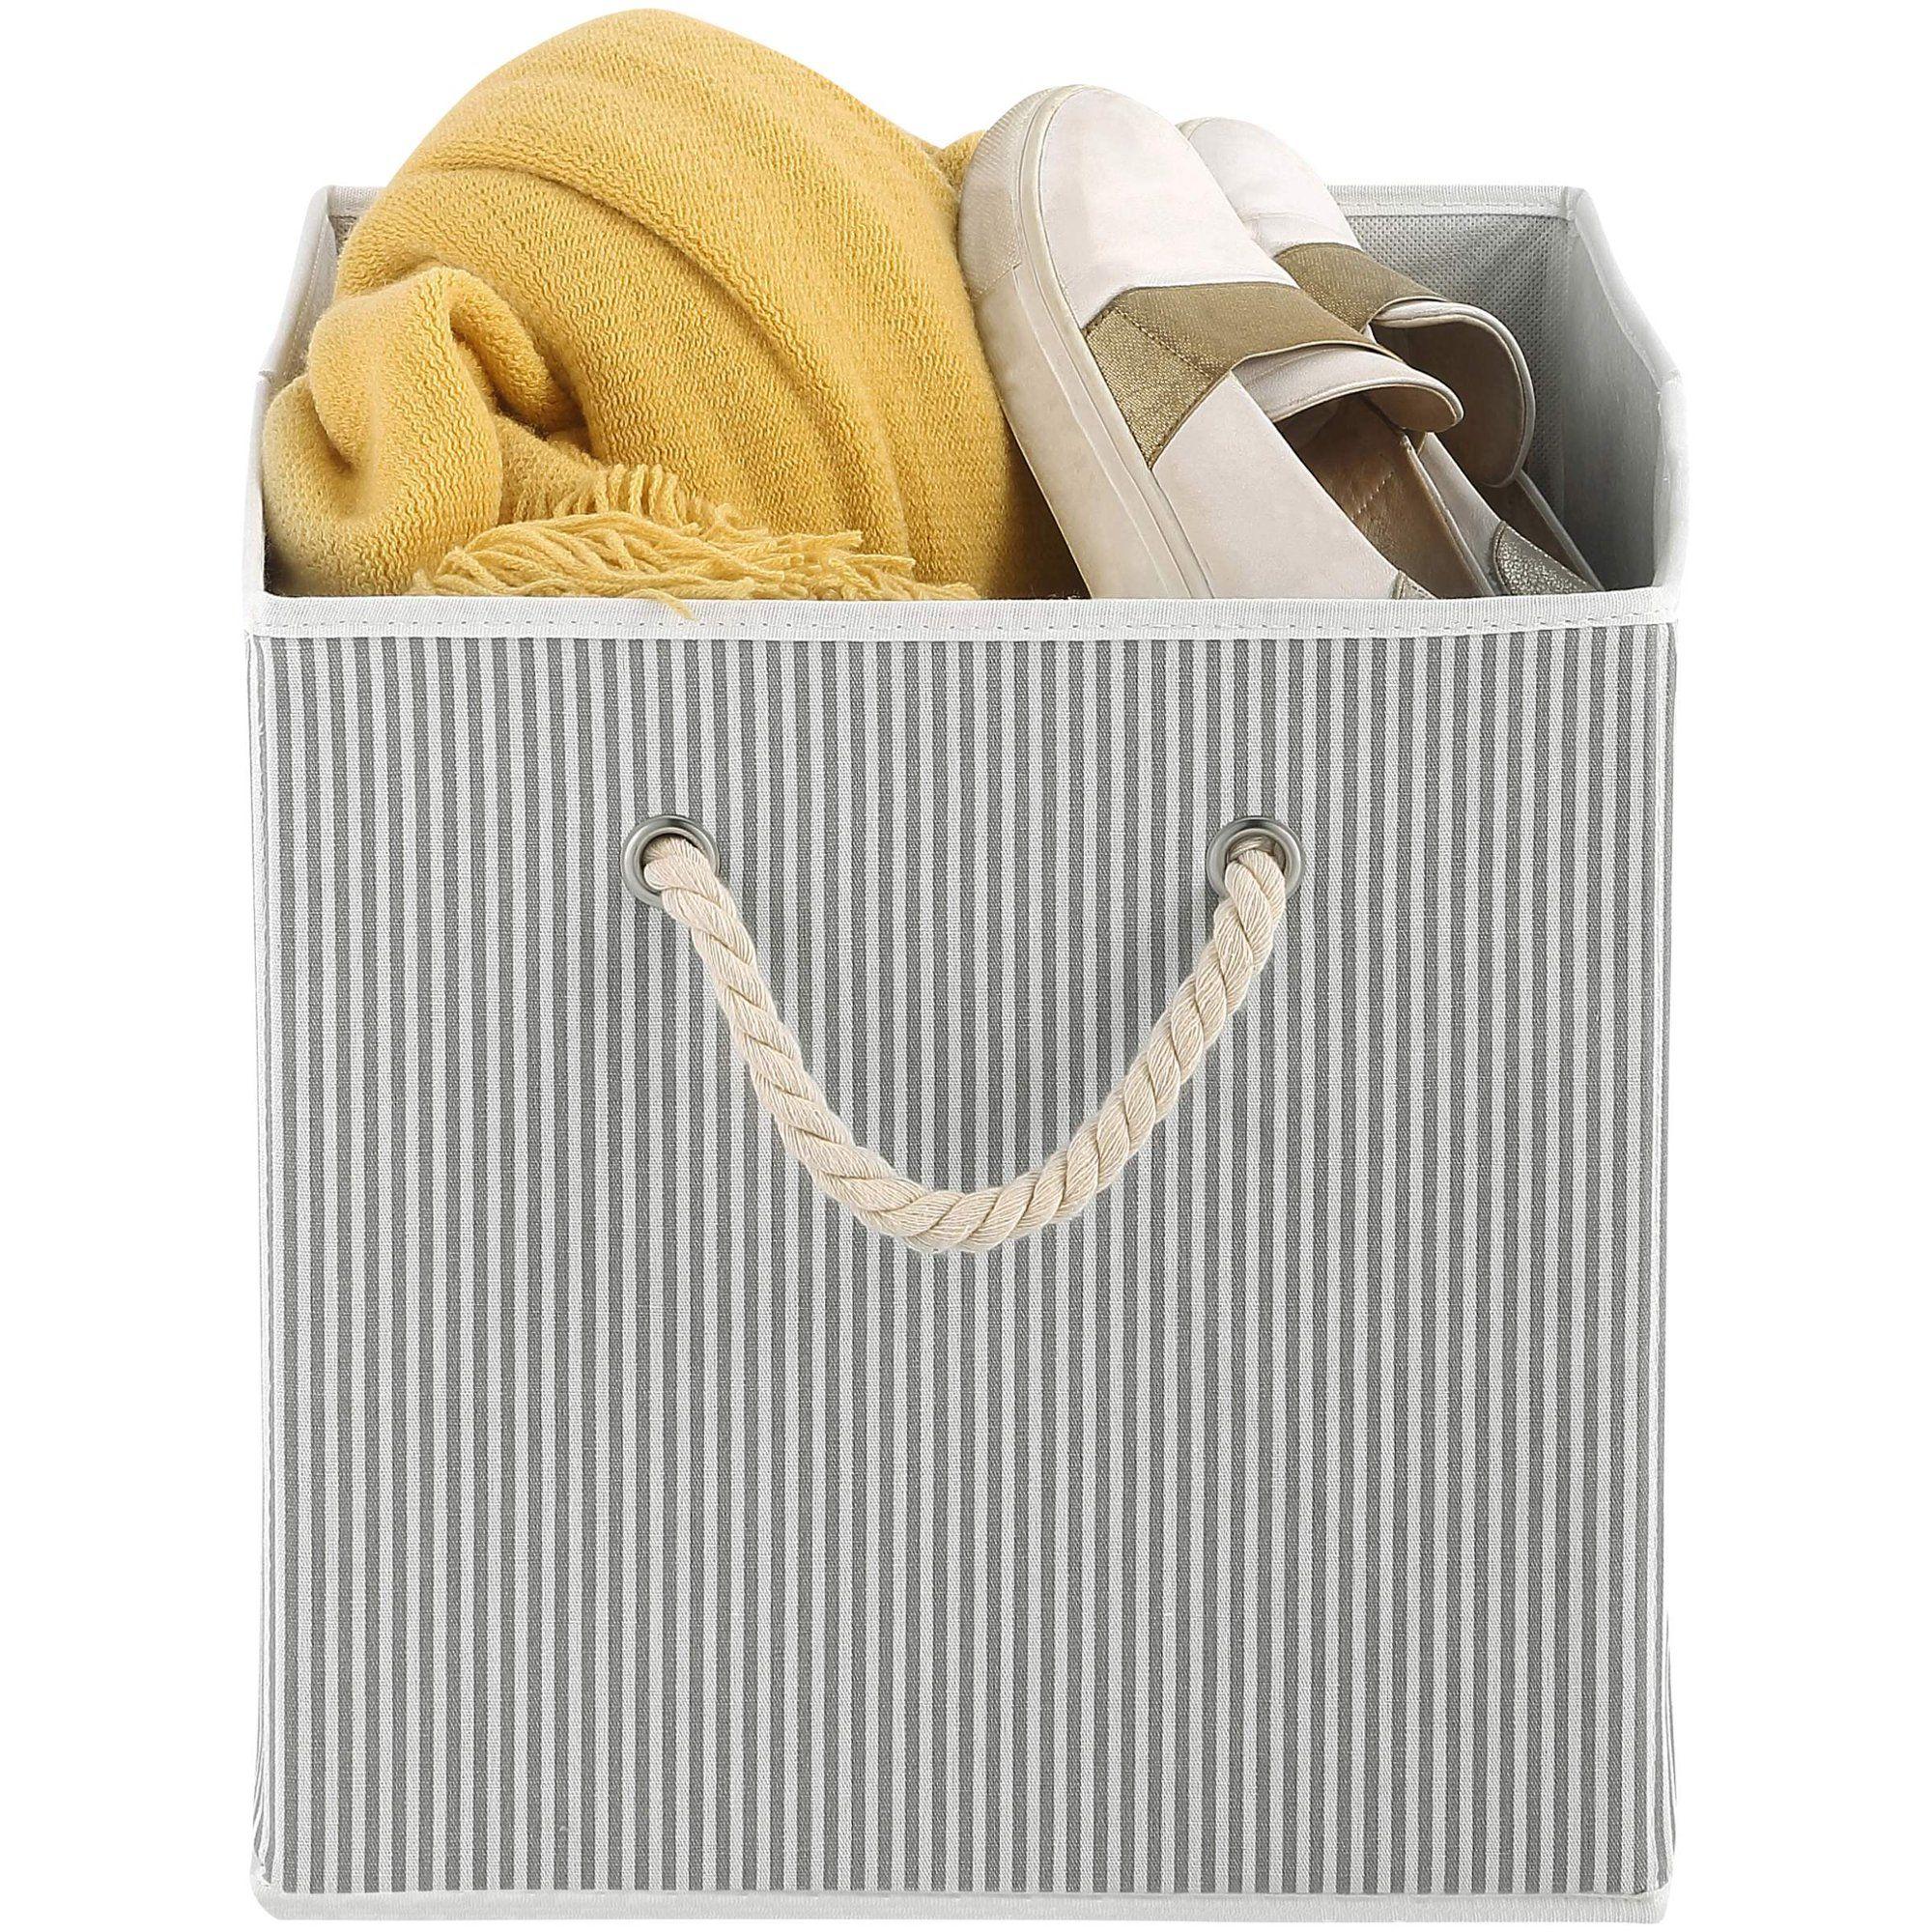 Closetmaid Wire Frame Fabric Storage Bin Fabric In Tan Size 10 63 L X 19 25 W X 11 02 H Wayfair Organization Vozeli Com